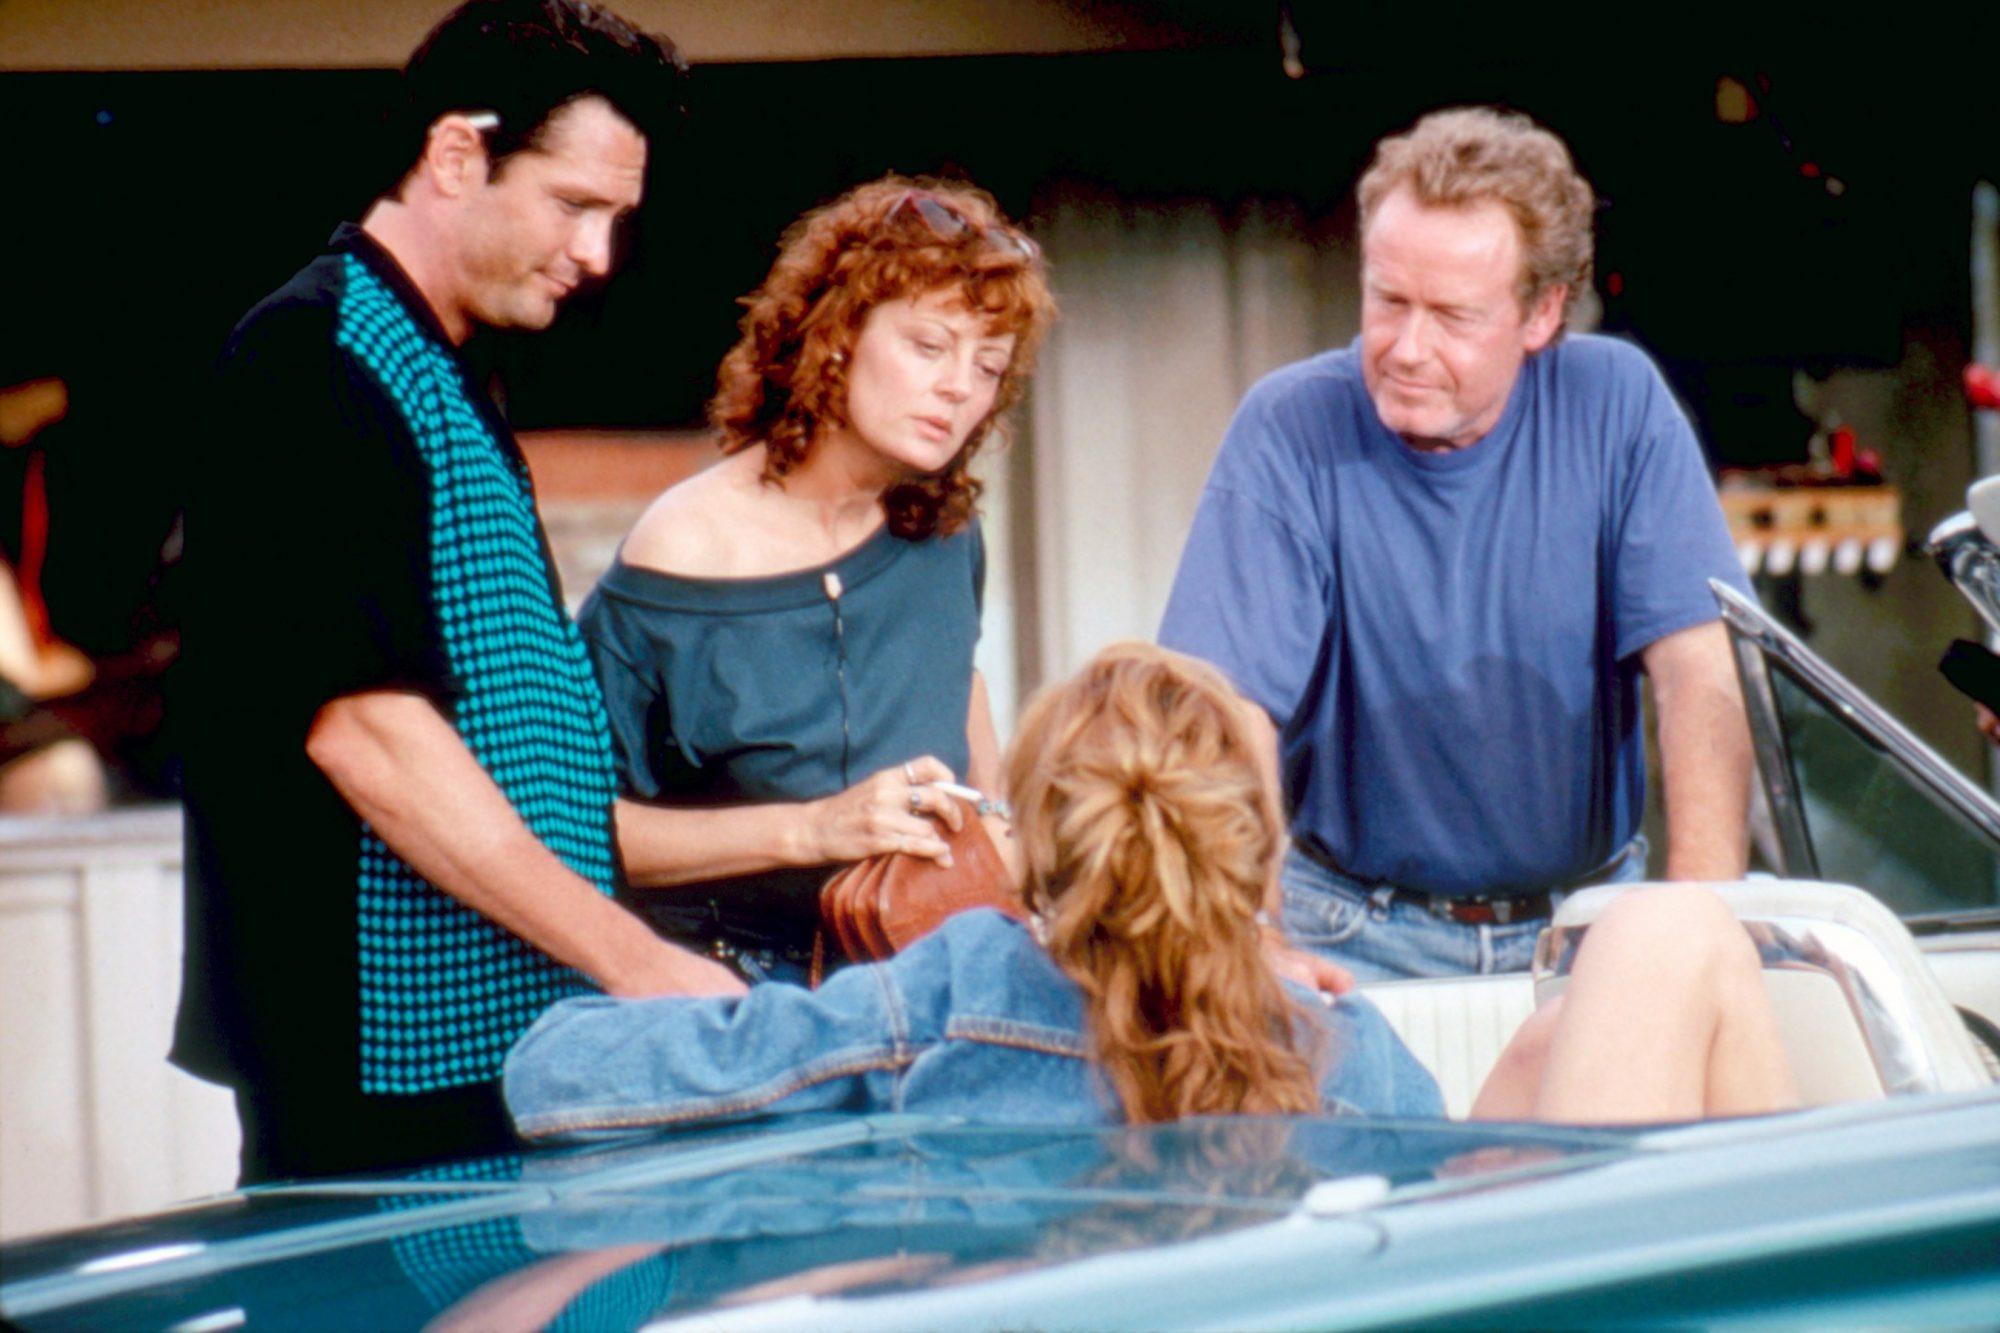 THELMA and LOUISE  Michael Madsen, Susan Sarandon, Geena Davis, director Ridley Scott, on set, 1991. ©